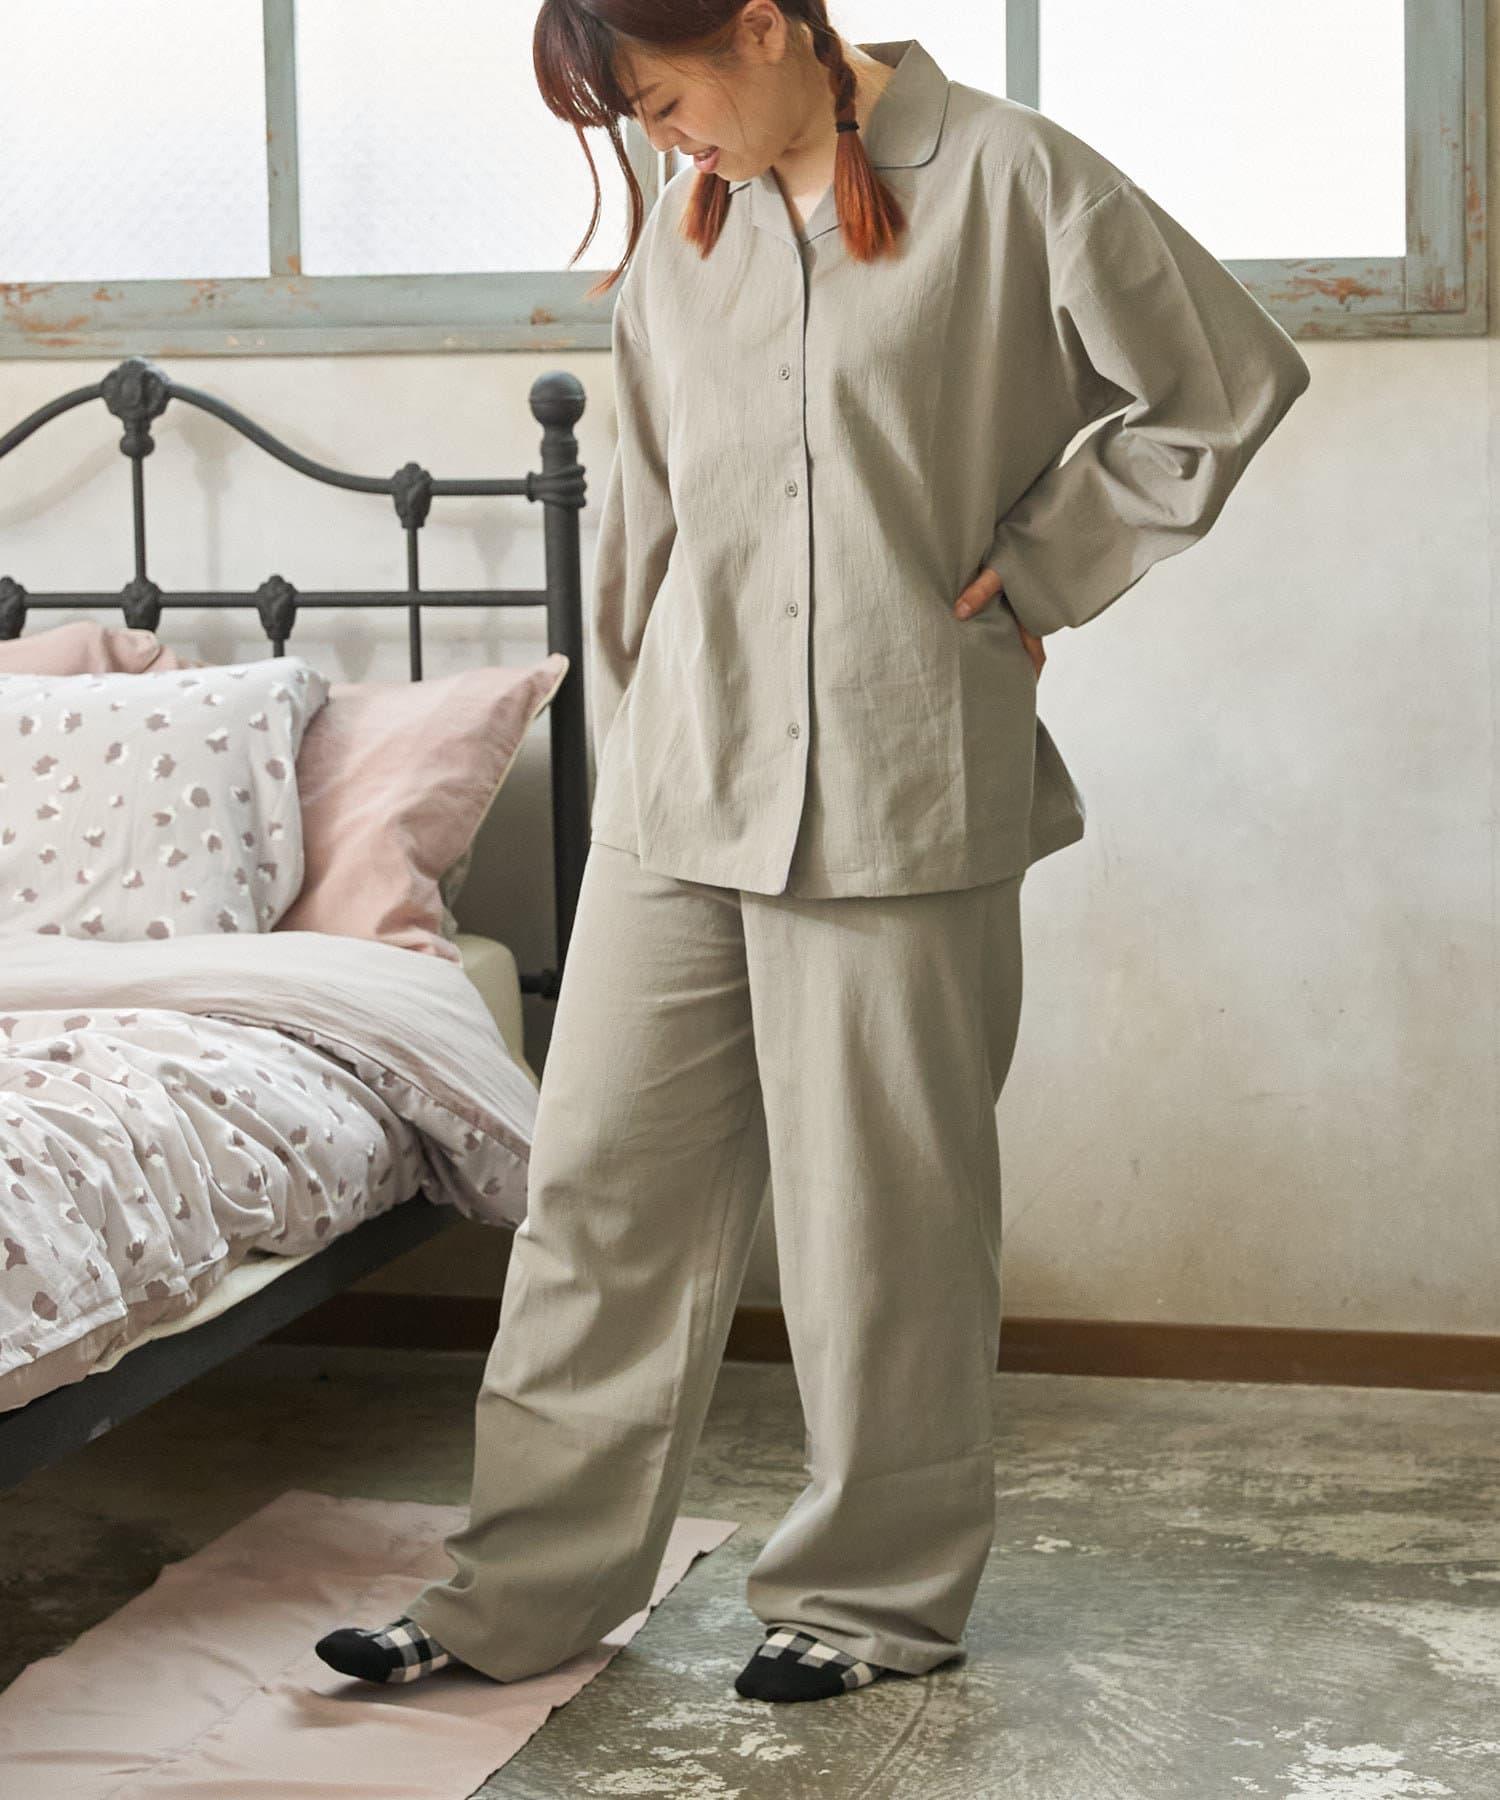 3COINS(スリーコインズ) 【自分好みのベッドルーム】パイピングパジャマ:Lサイズ